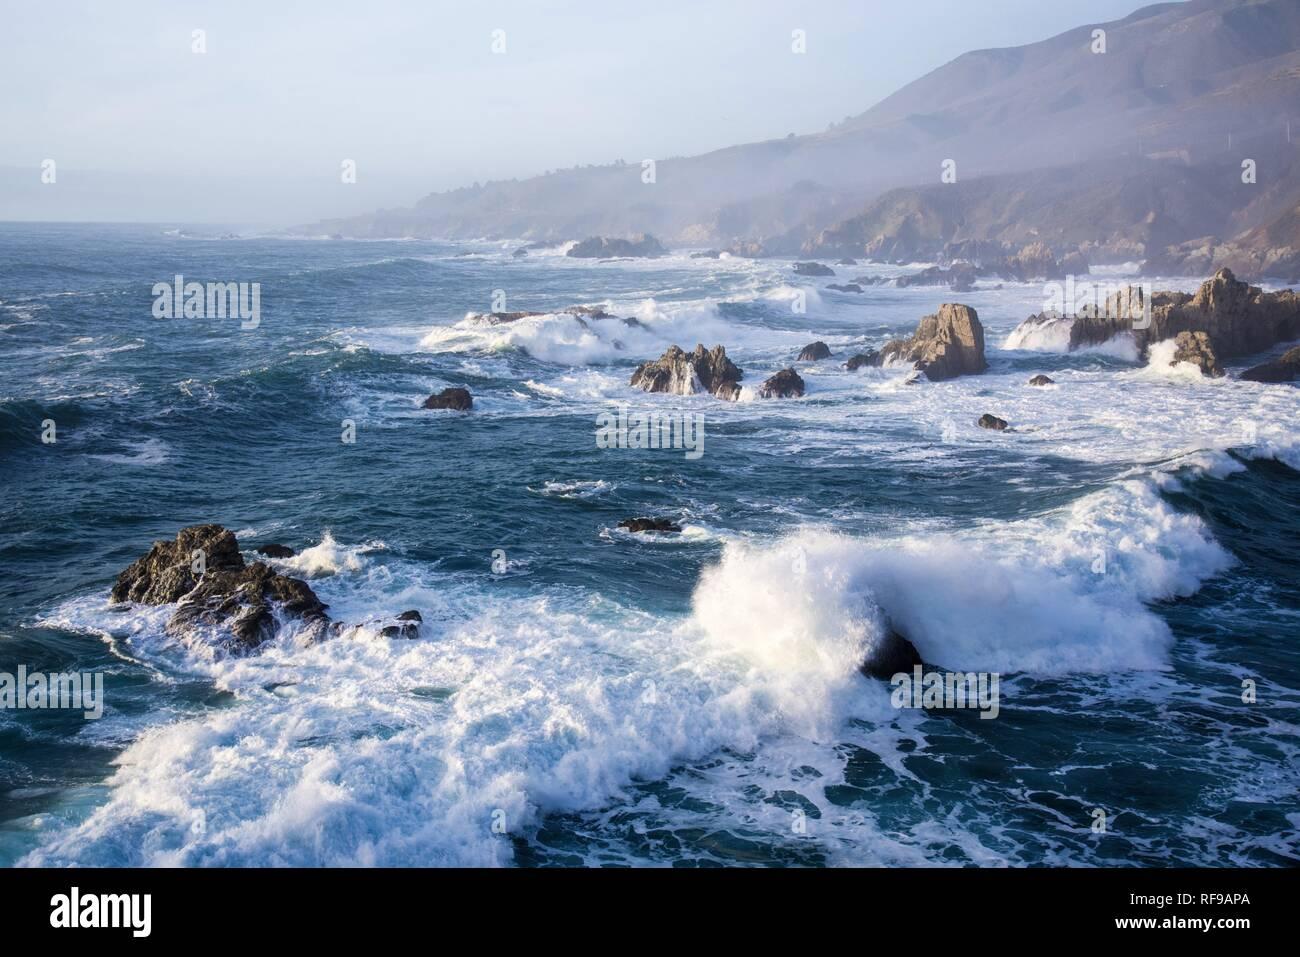 Crashing waves and rocky shores of the Monterey Peninsula. - Stock Image